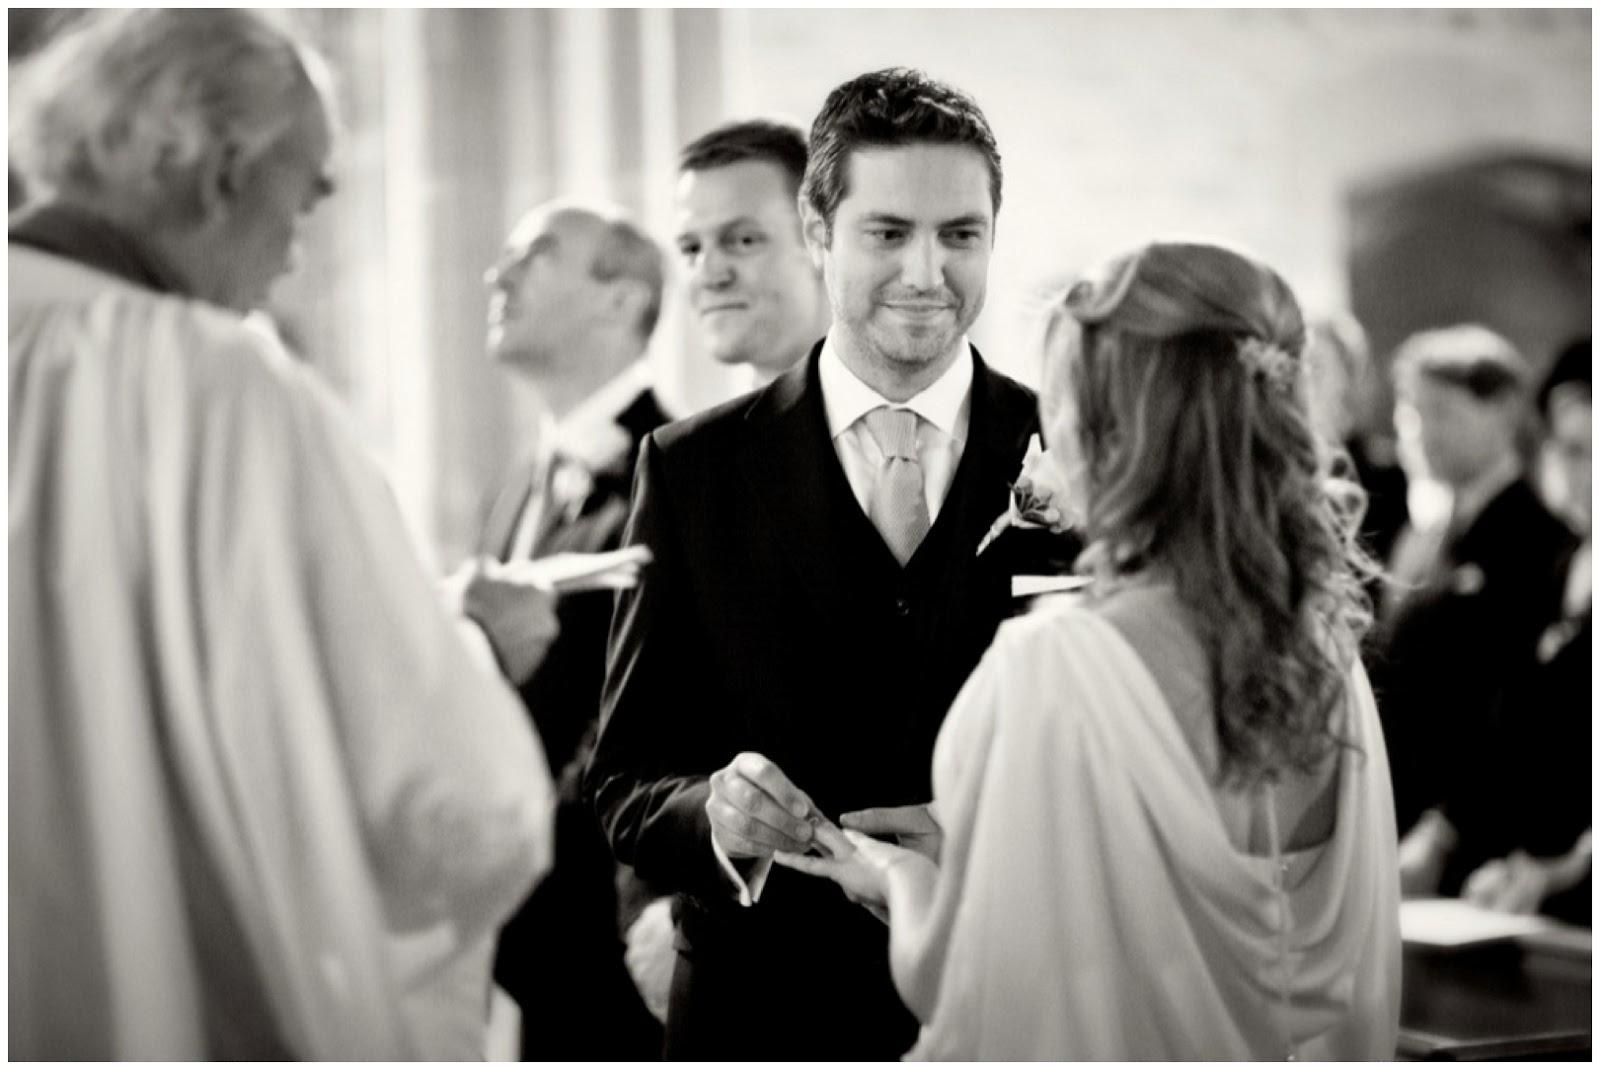 Laura butler wedding